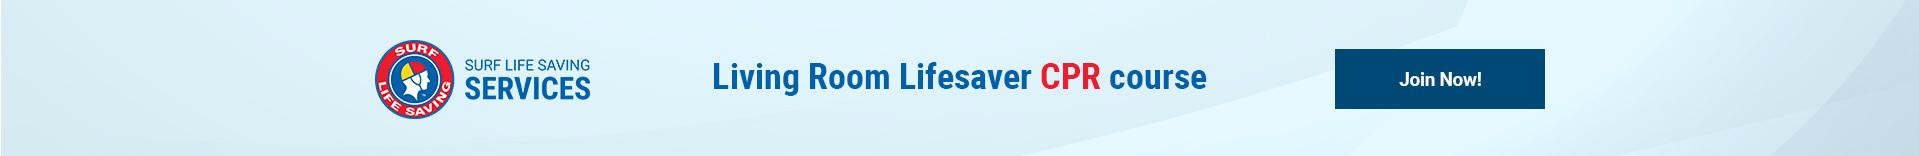 Madimack Surf Life Saving Banner